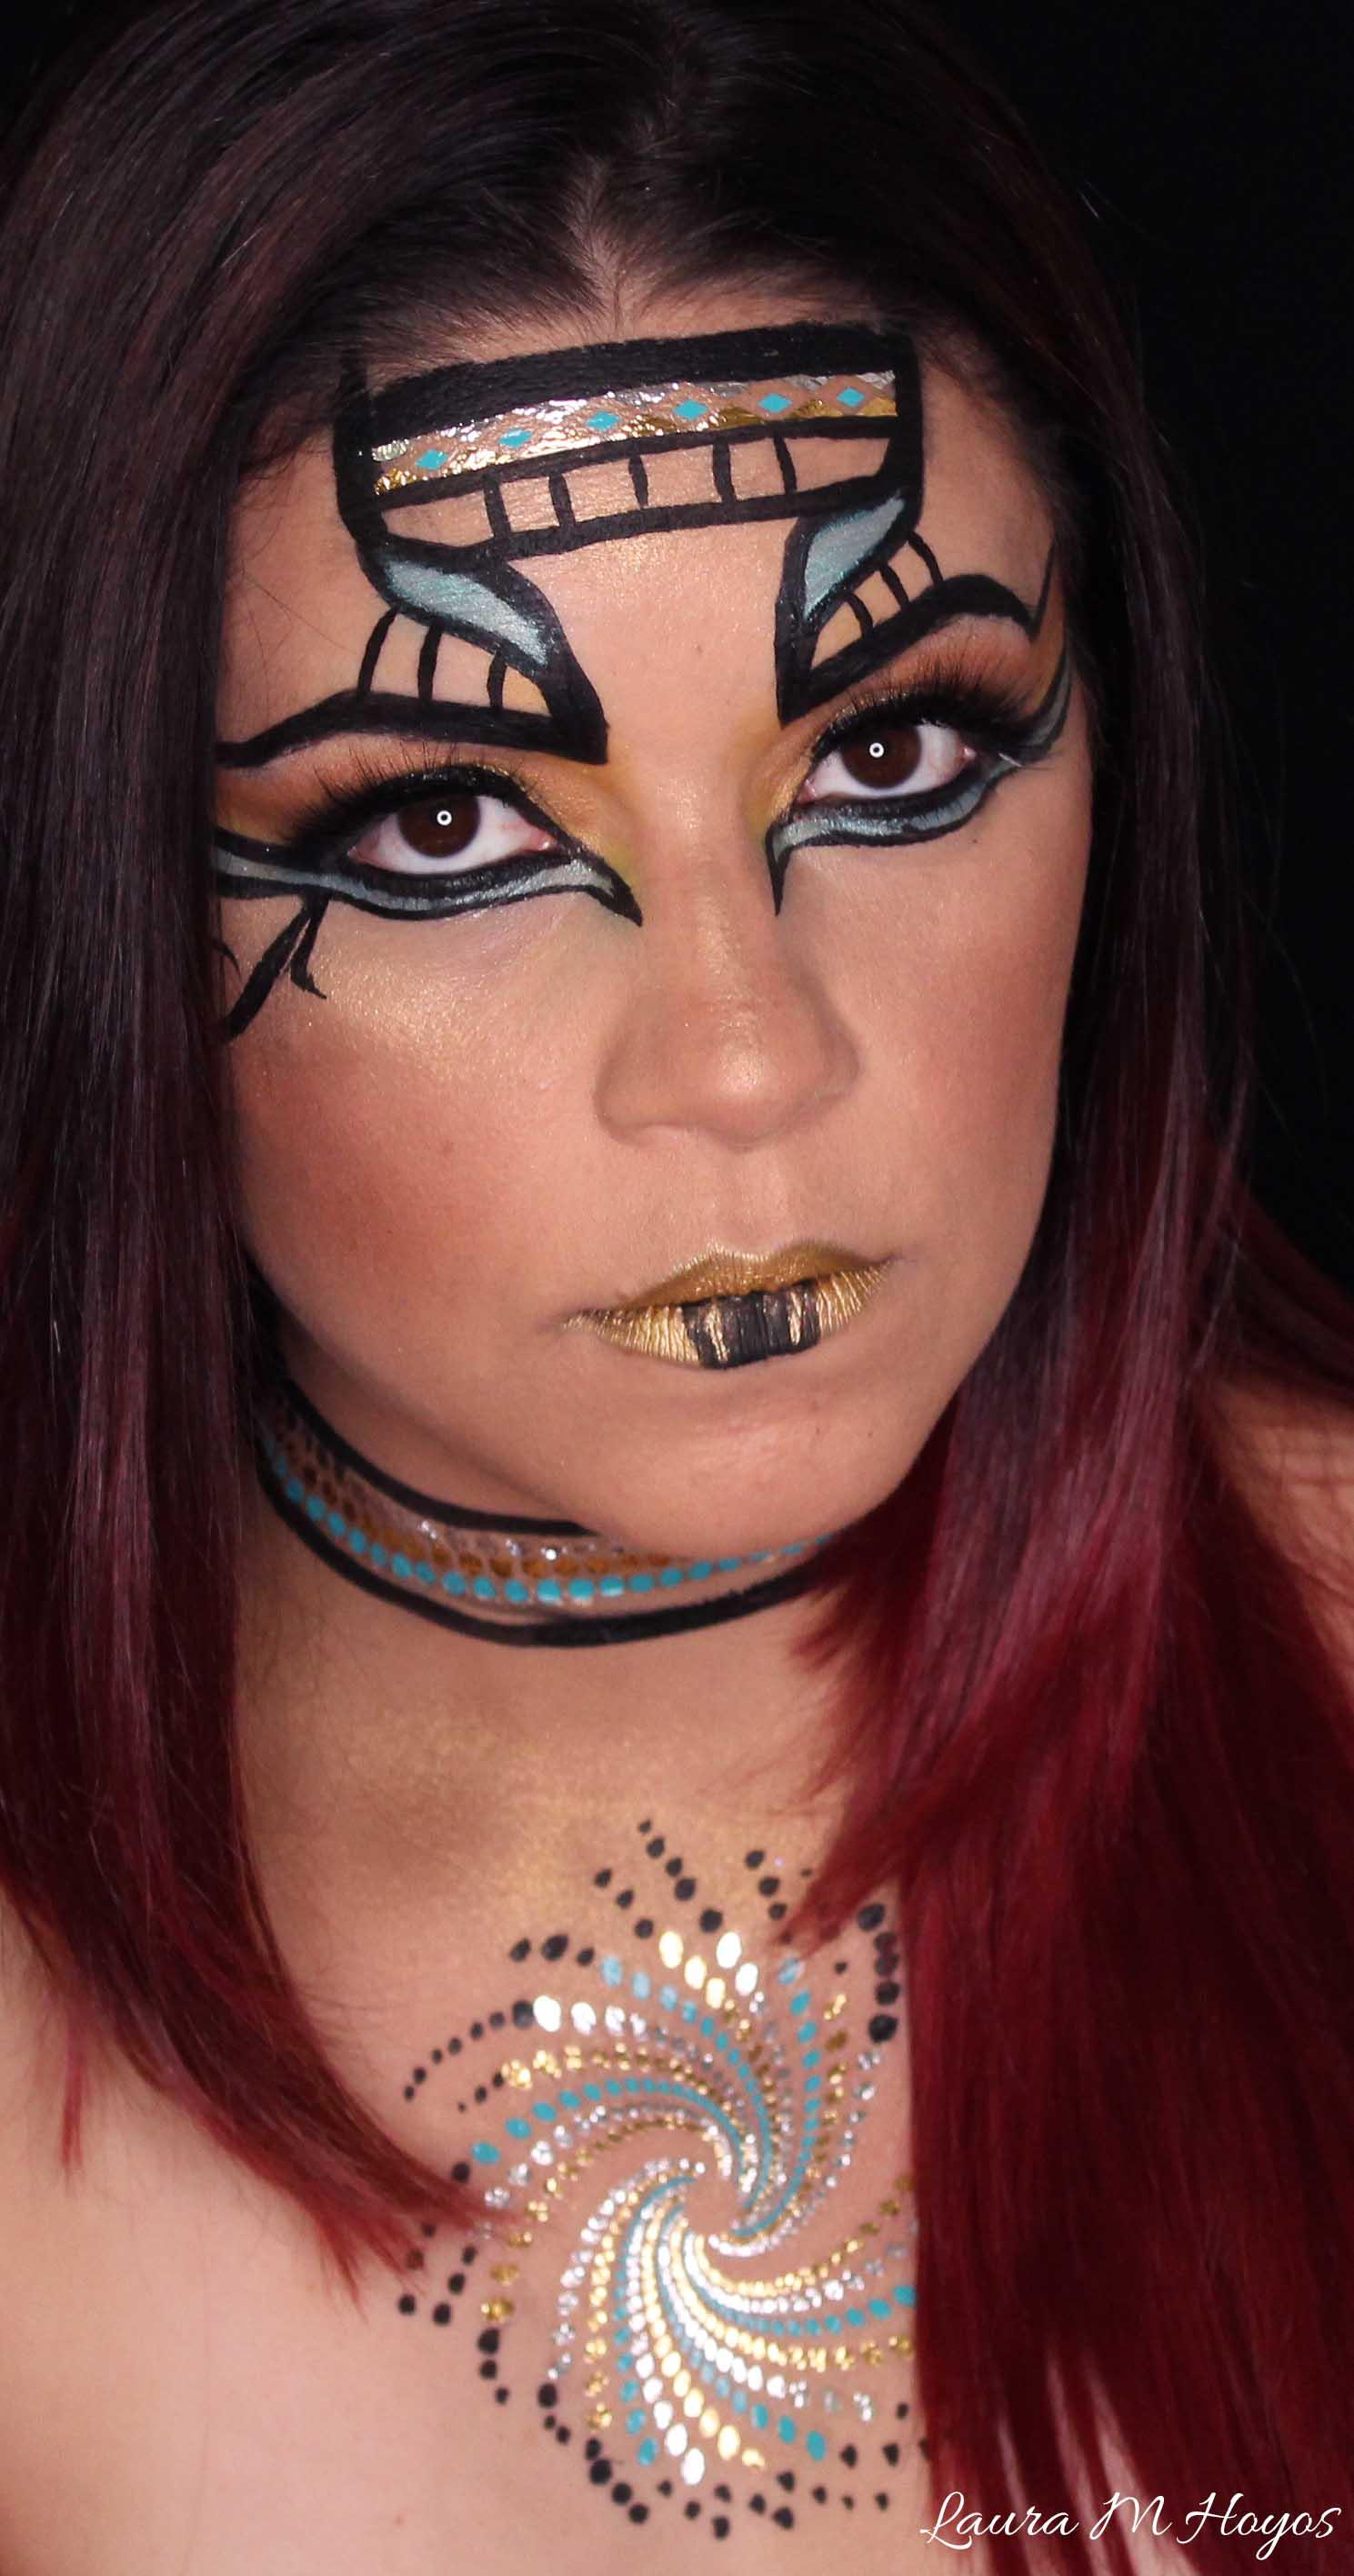 Cleopatra inspired Makeup